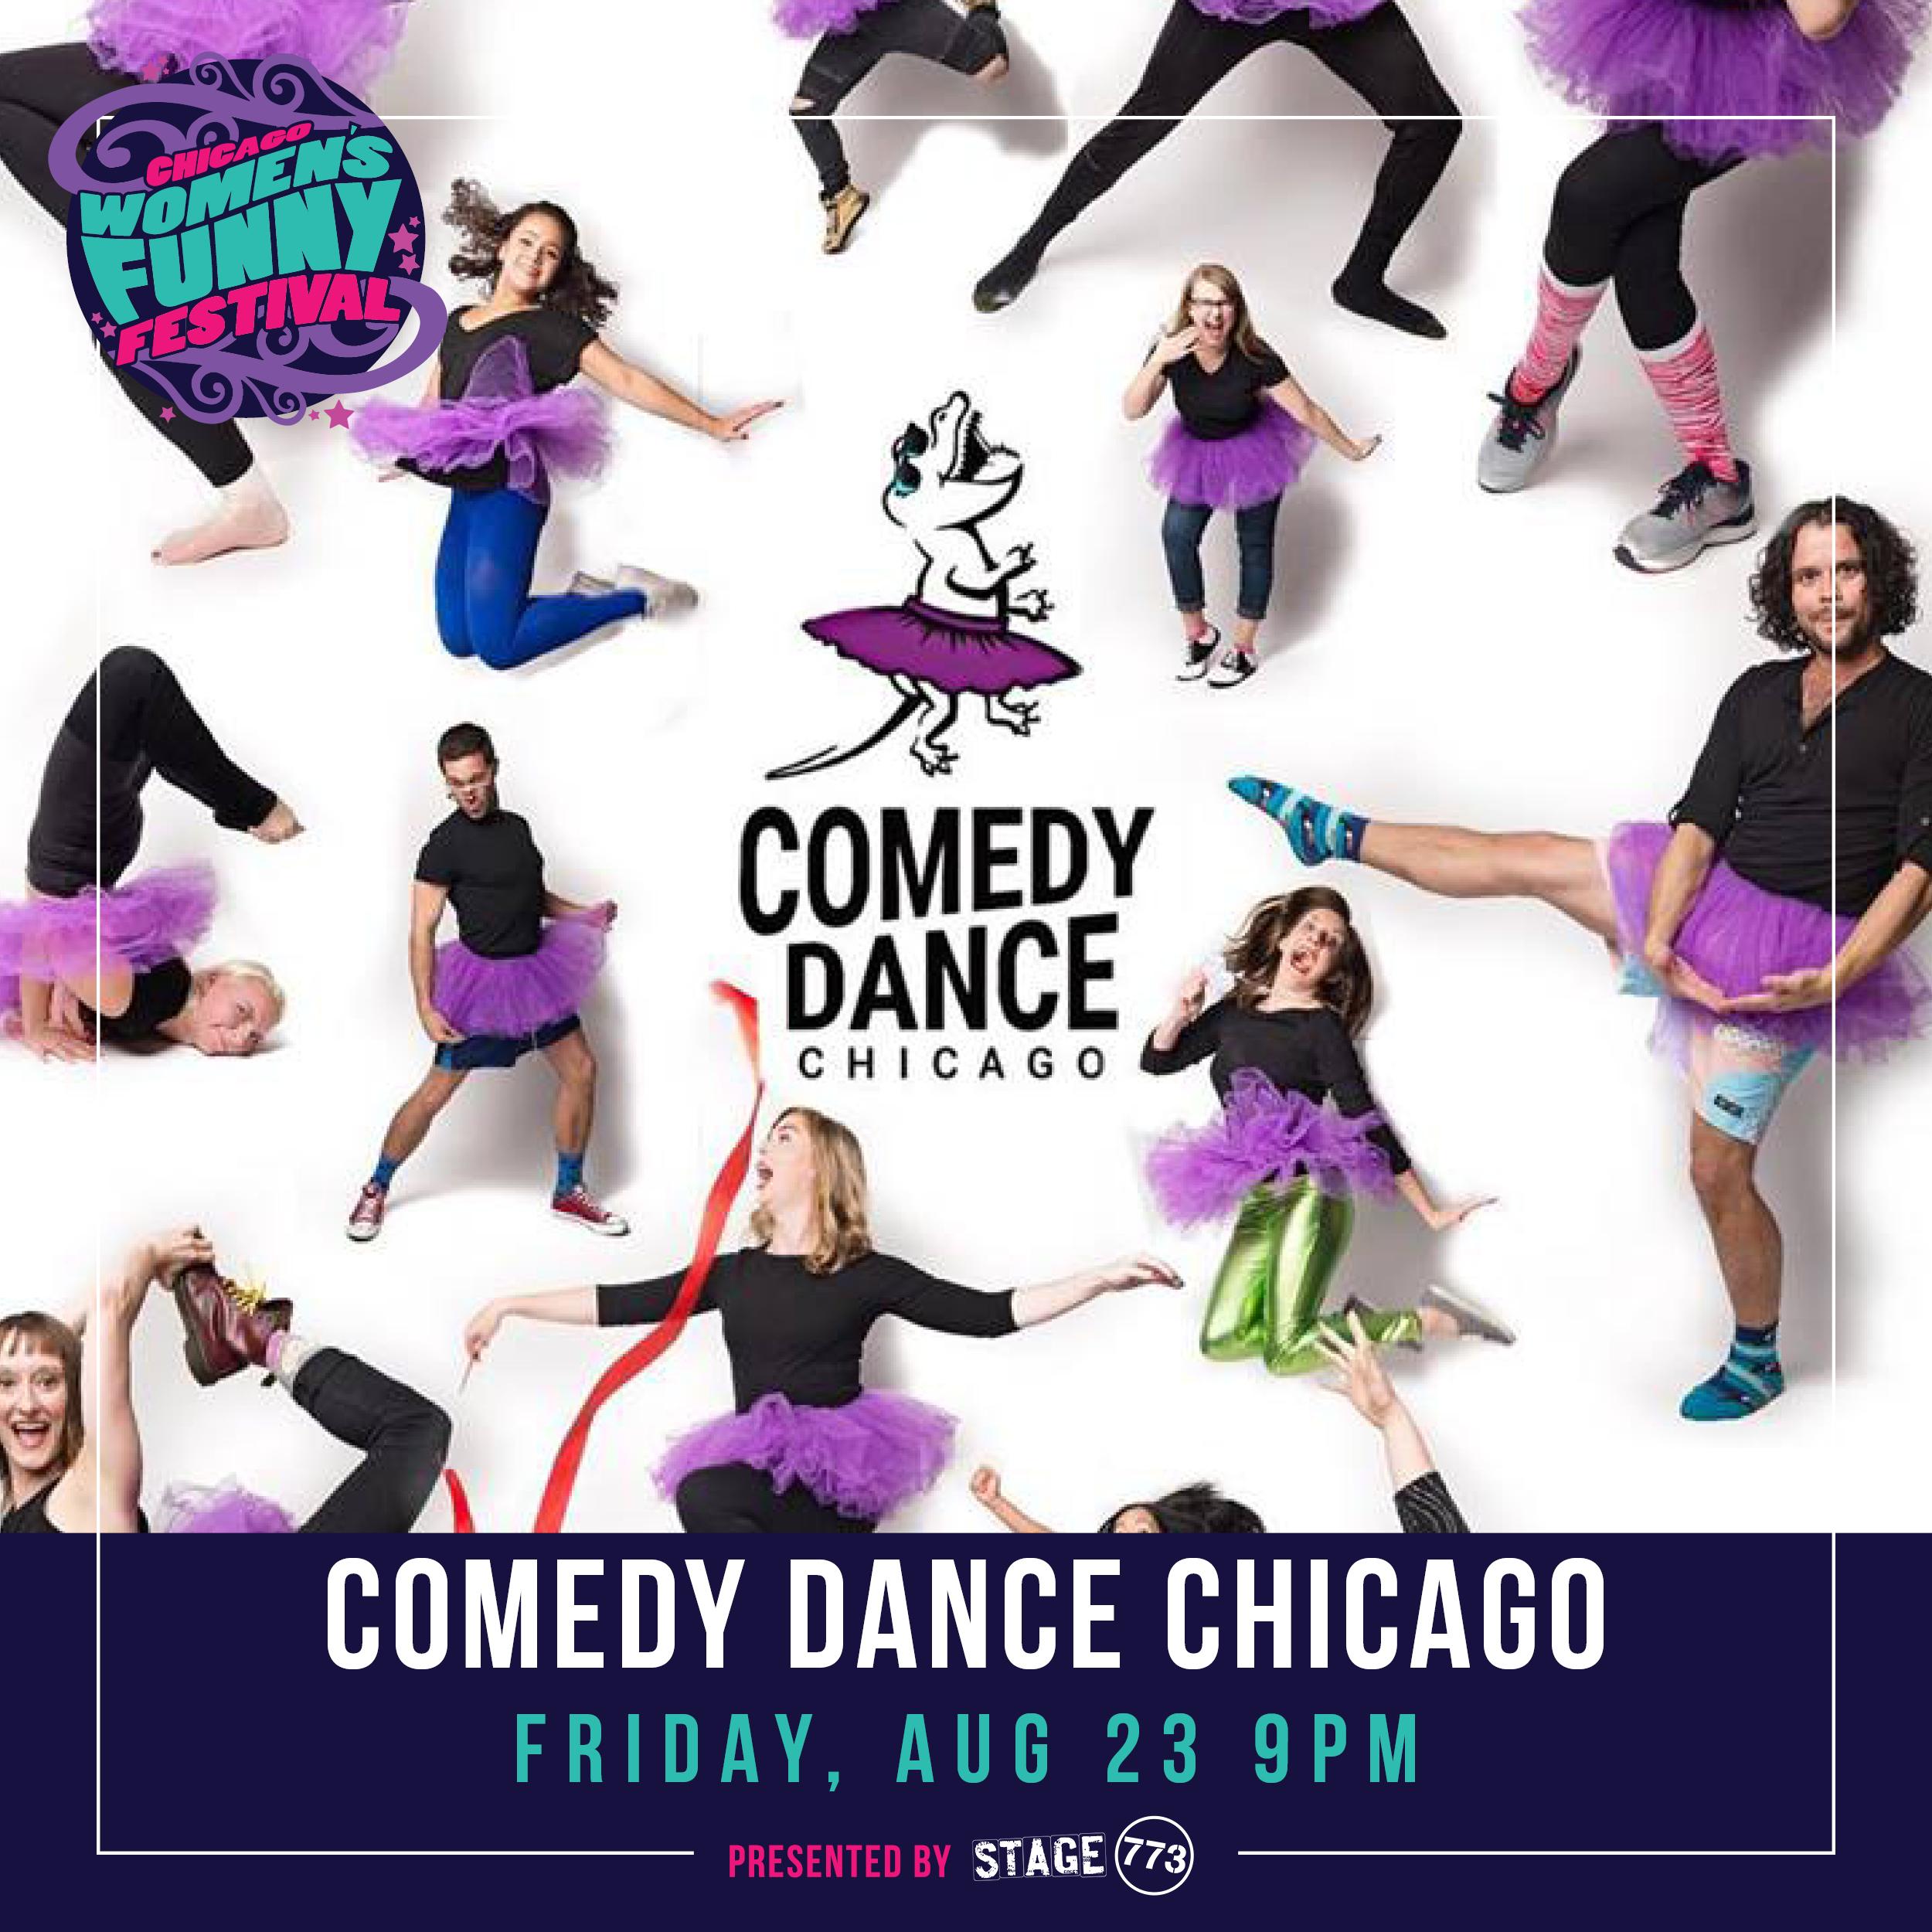 ComedyDanceChicago_Friday_9PM_CWFF20196.jpg